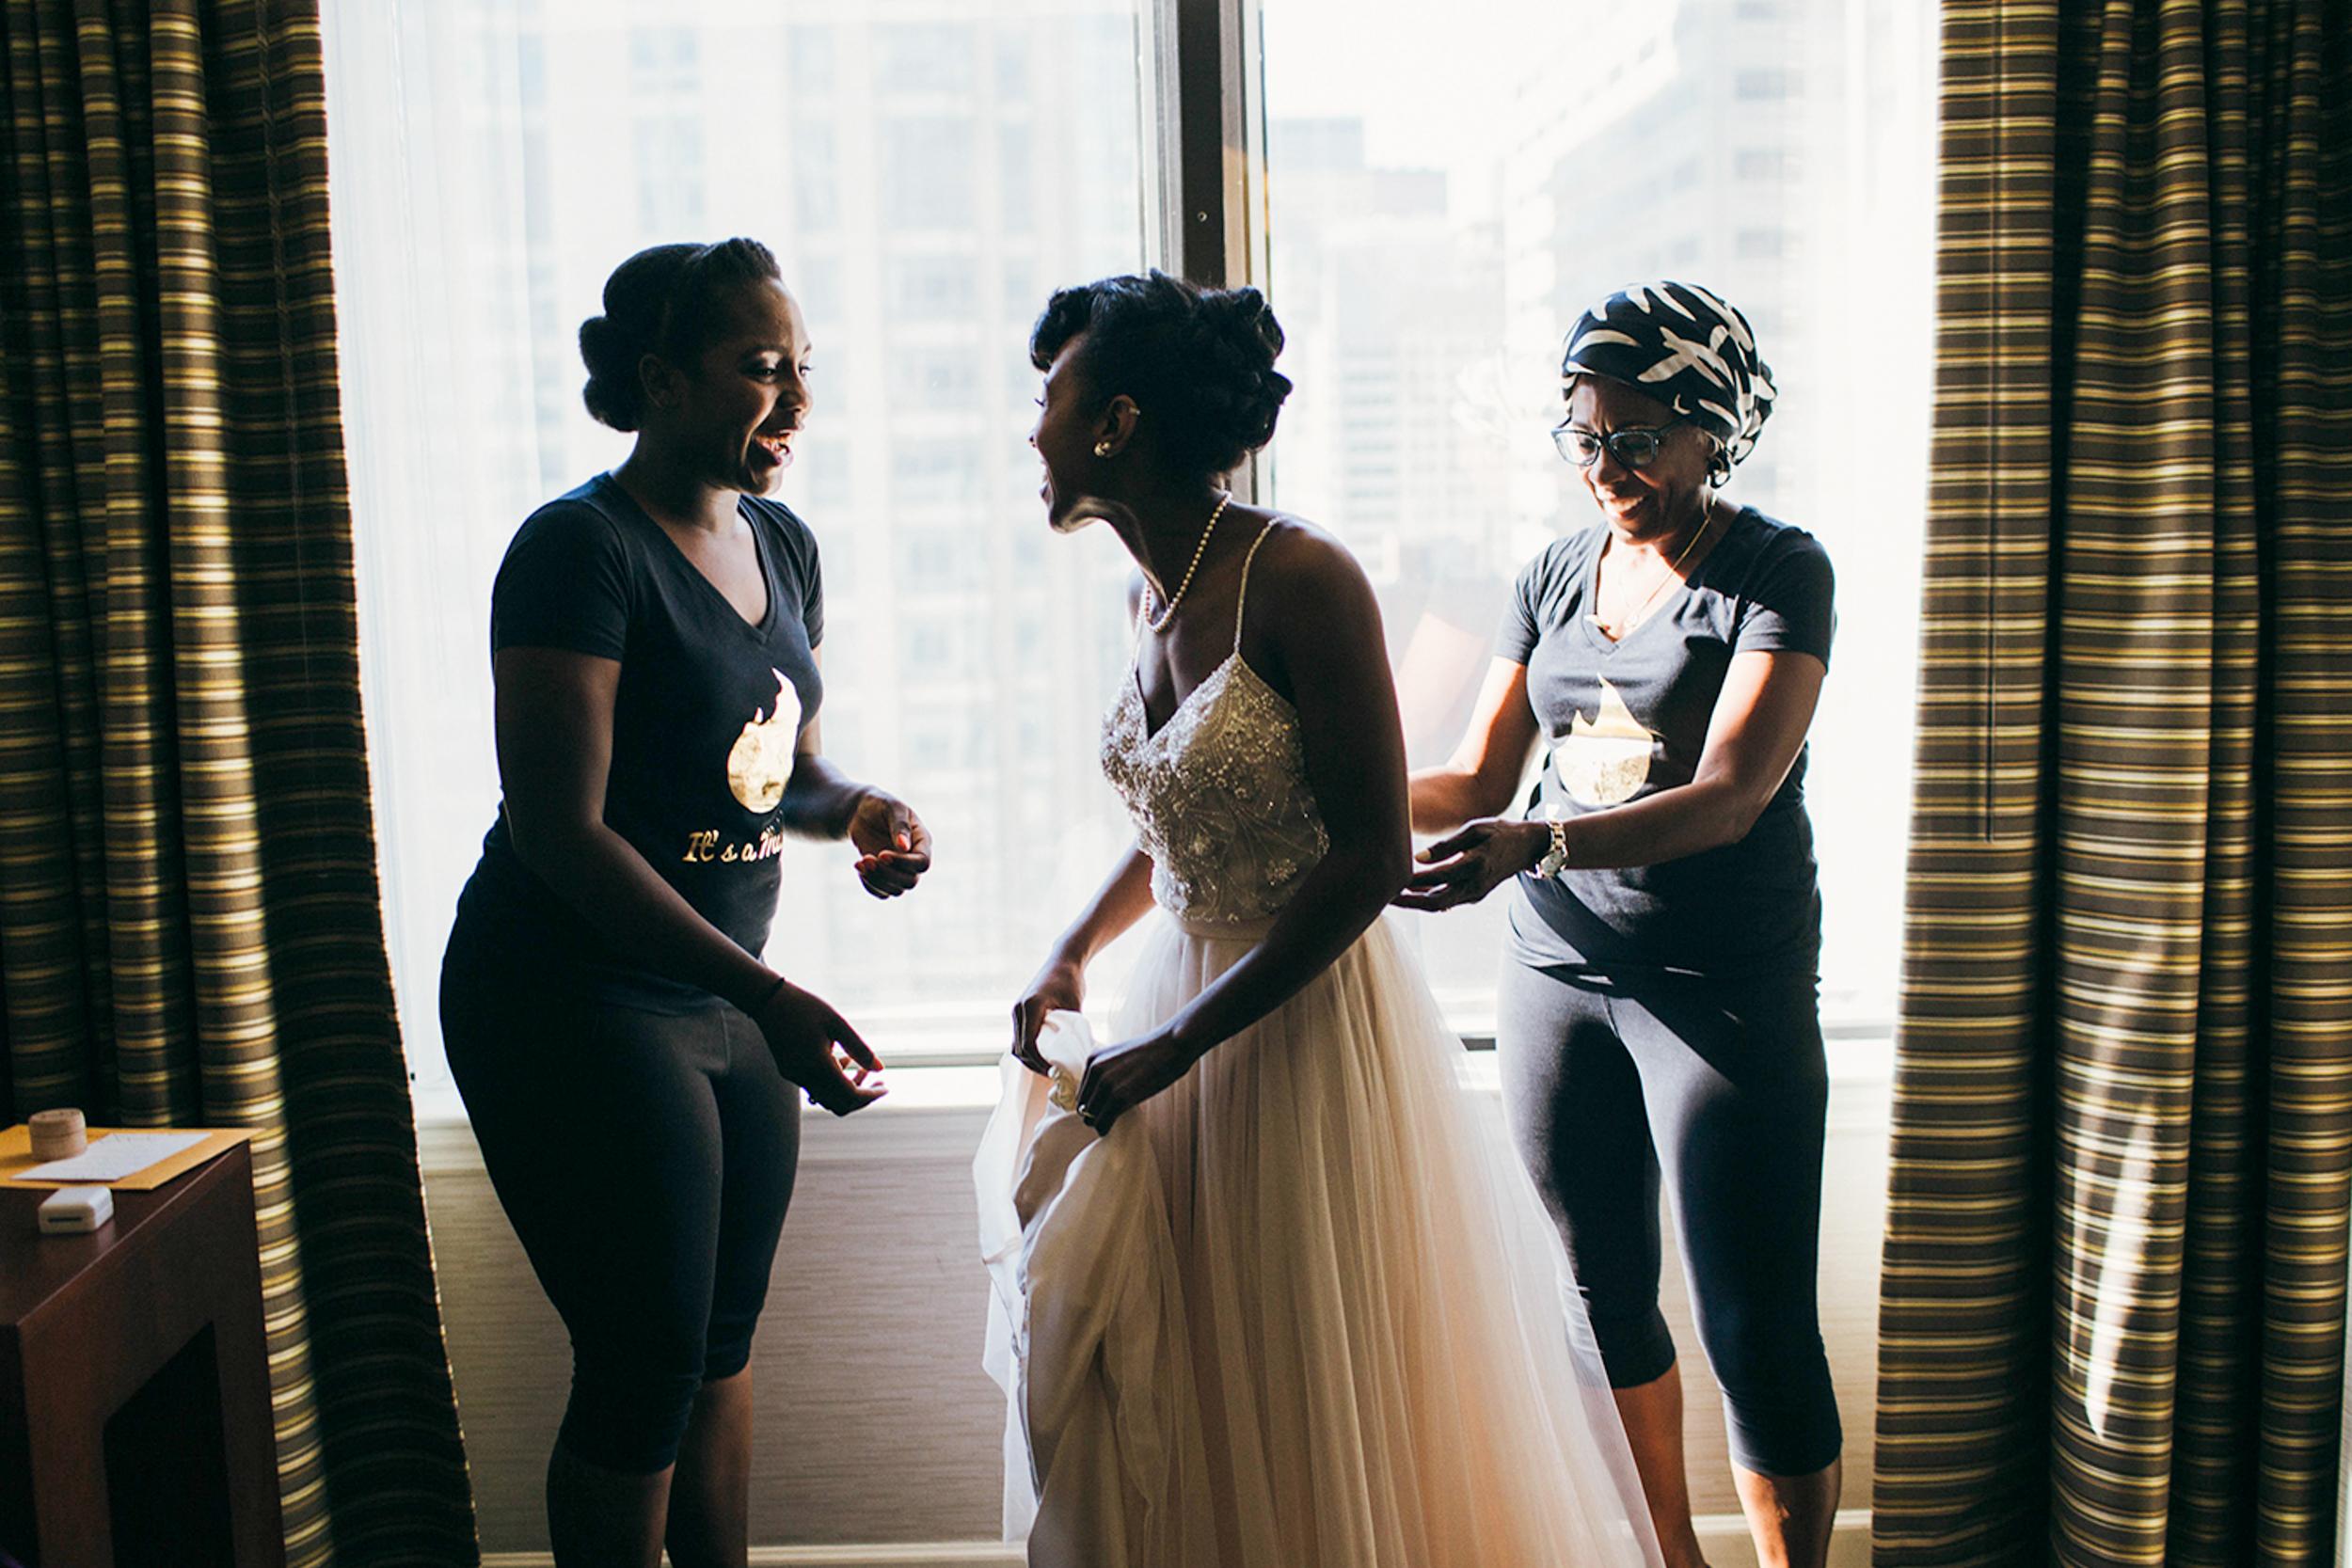 chicago.wedding.urban.intimate.zed451.lake.milton olive park-14.jpg